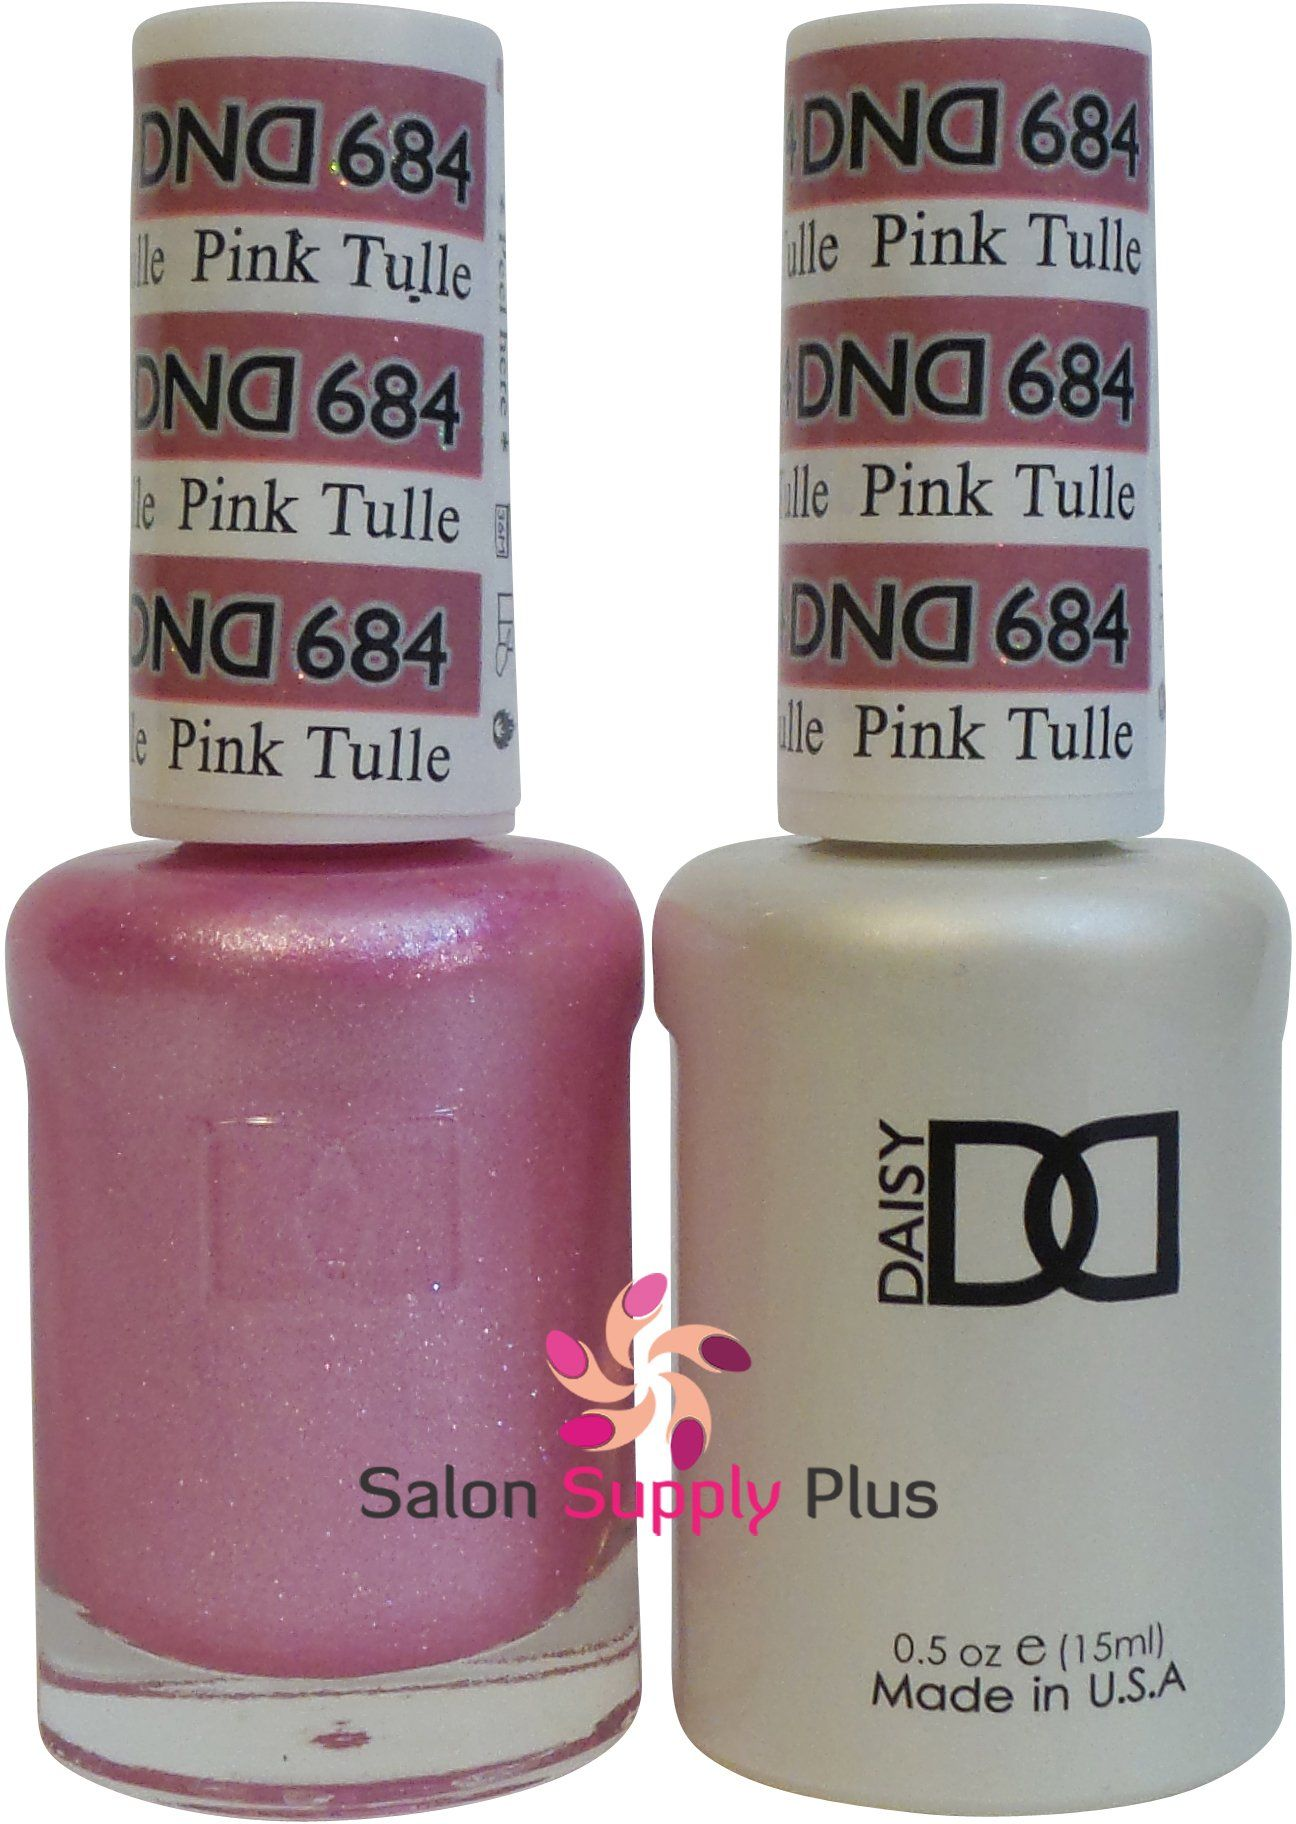 684 Dnd Duo Gel Pink Tullie Dnd Gel Polish Dnd Nail Polish Gel Polish Colors